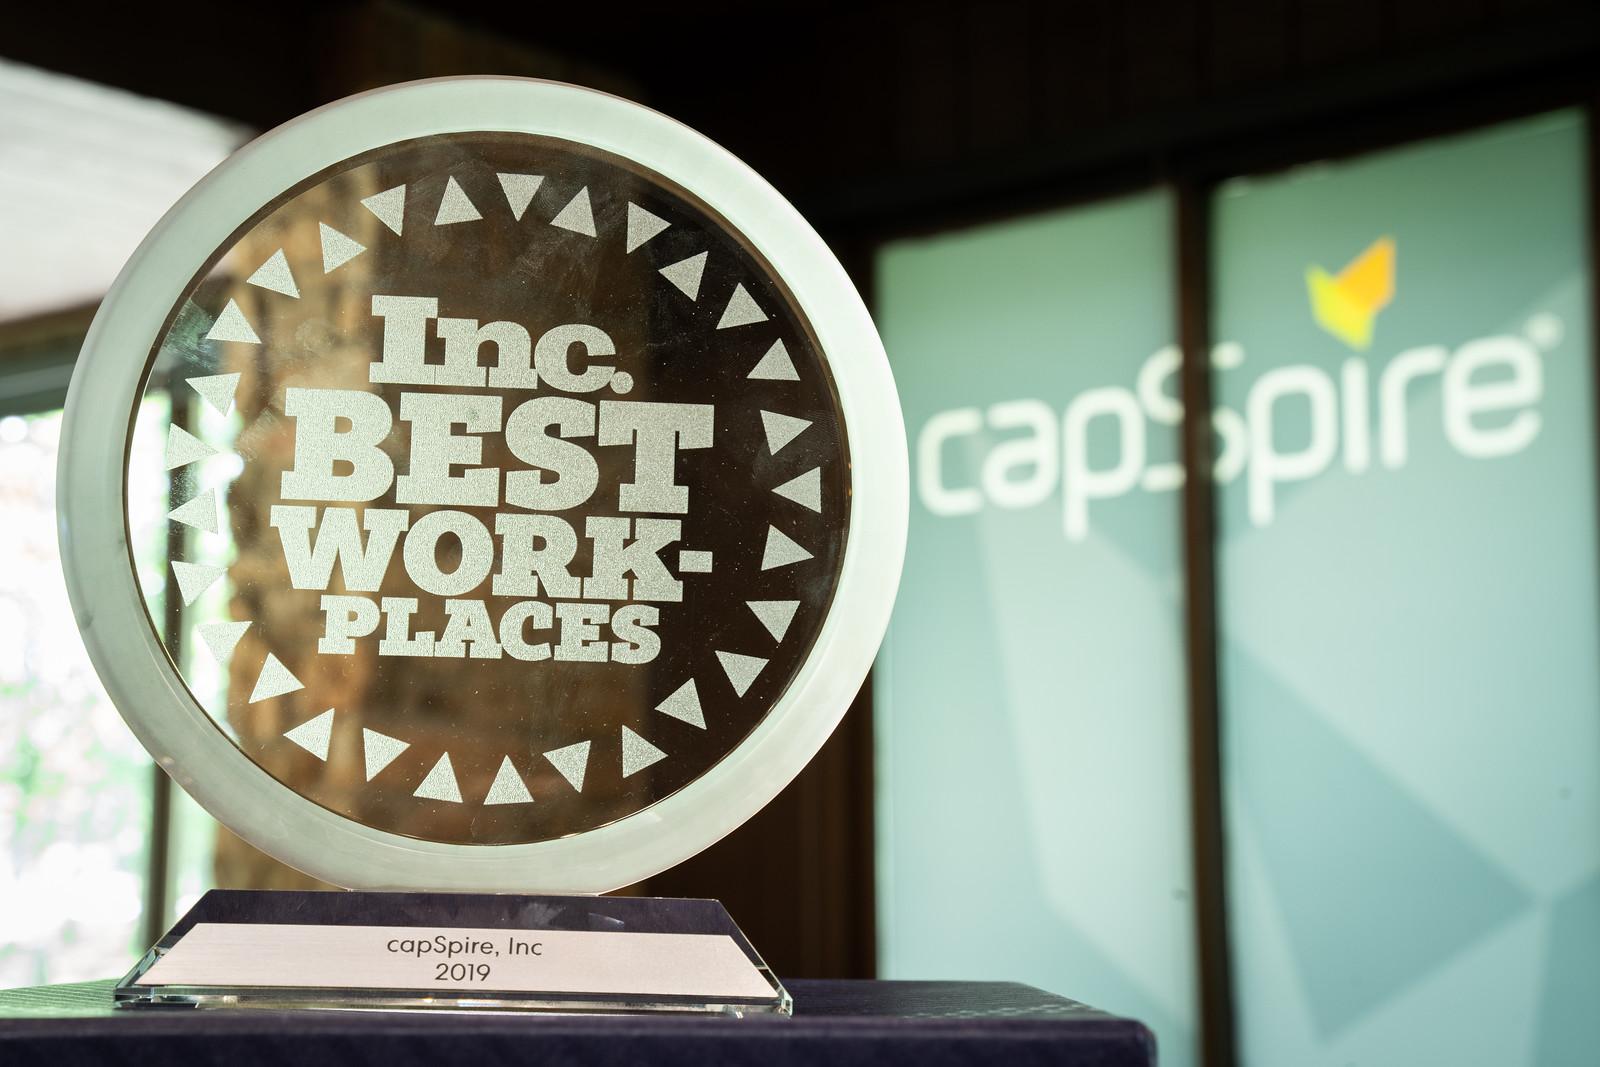 capSpire Lands on Inc. Magazine's 2019 Best Workplaces List